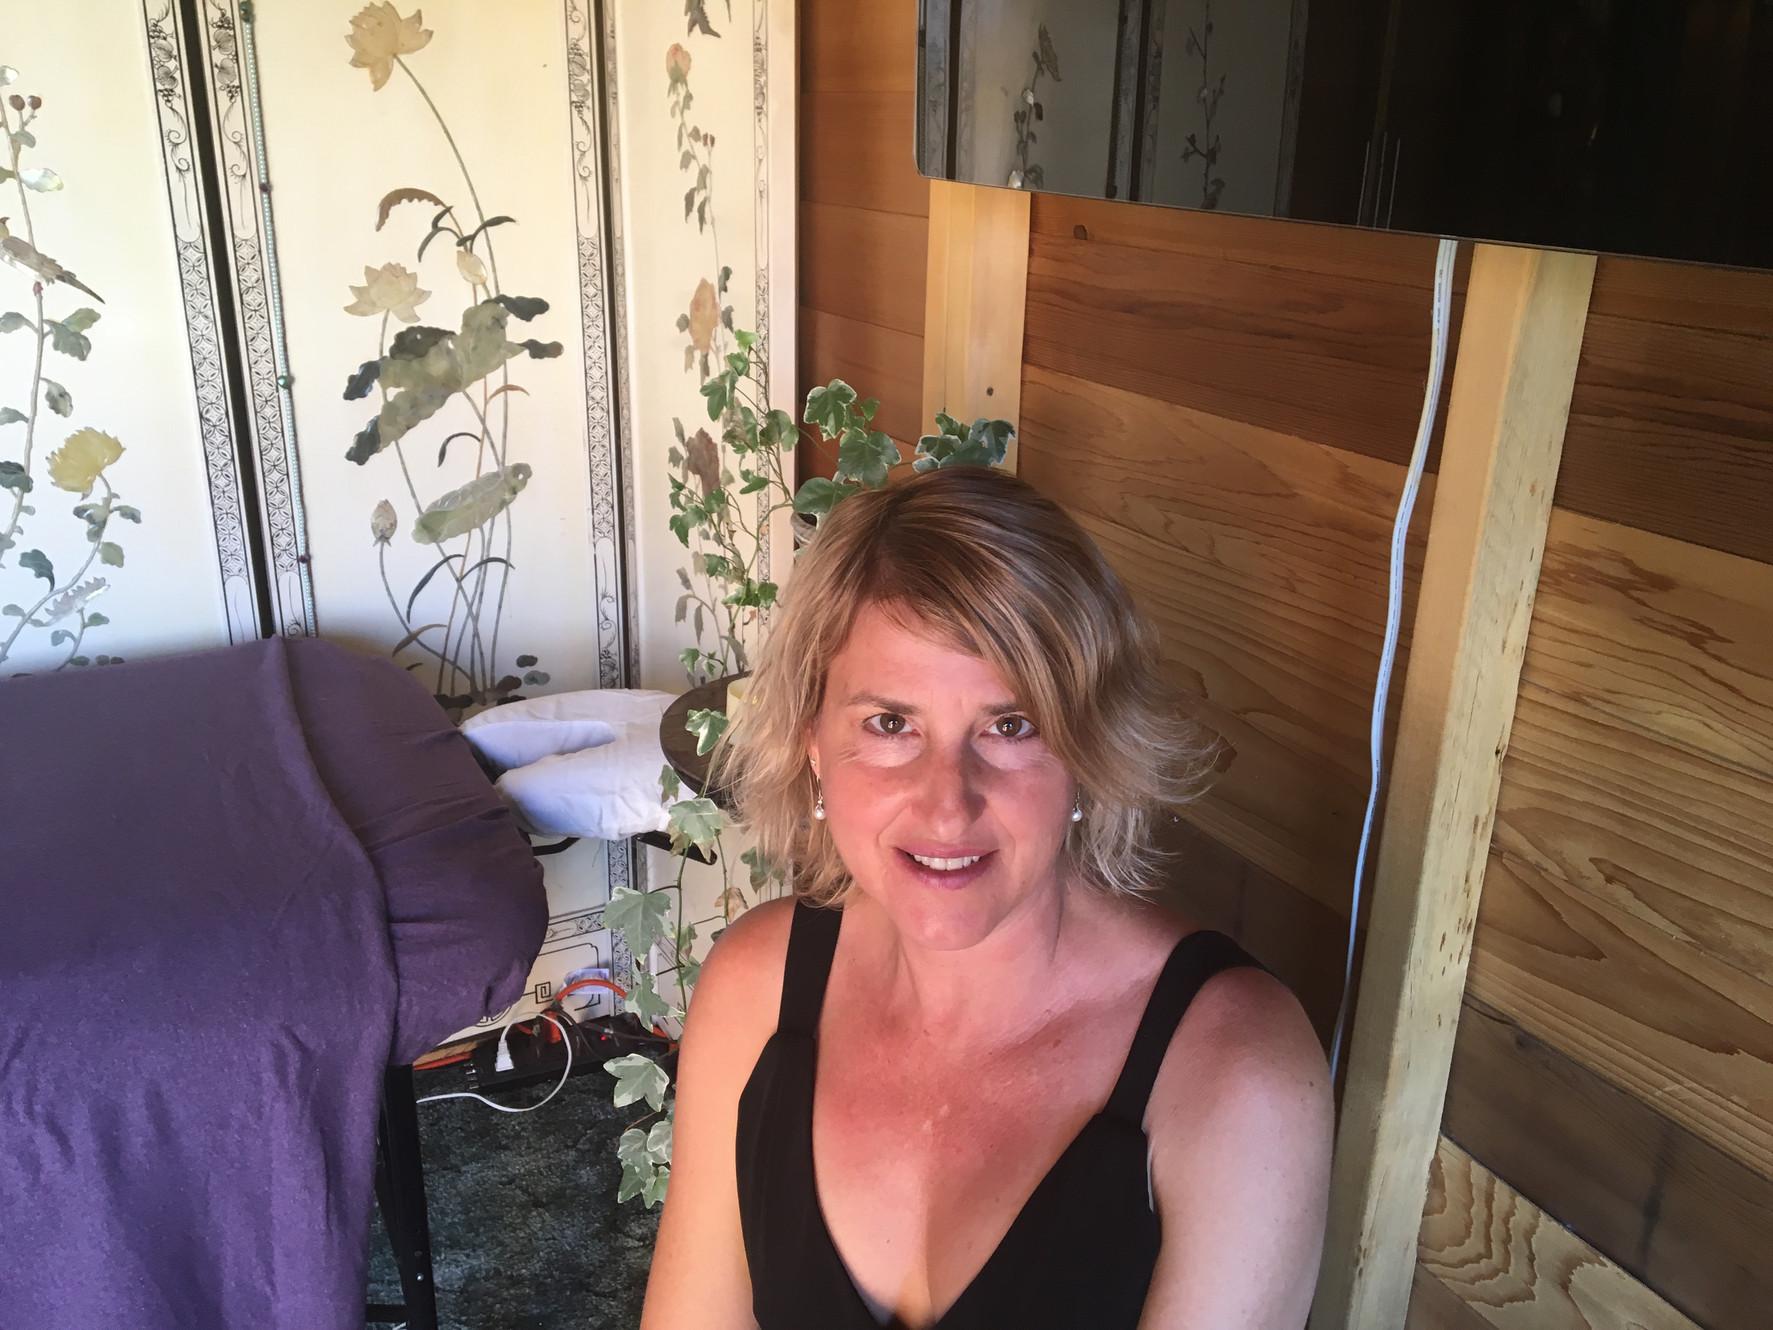 & lomi massage tantra lomi 🔥 Erotic